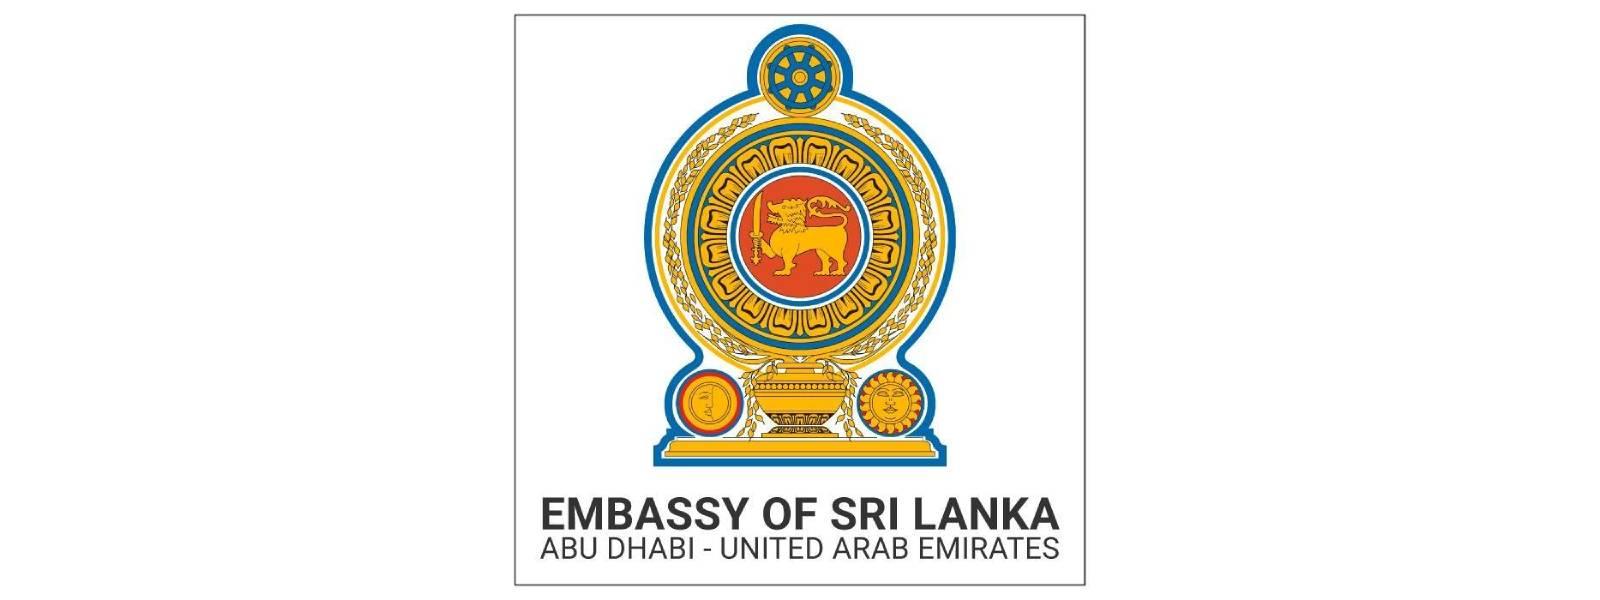 Sri Lanka's UAE Embassy urges for new criteria in repatriation